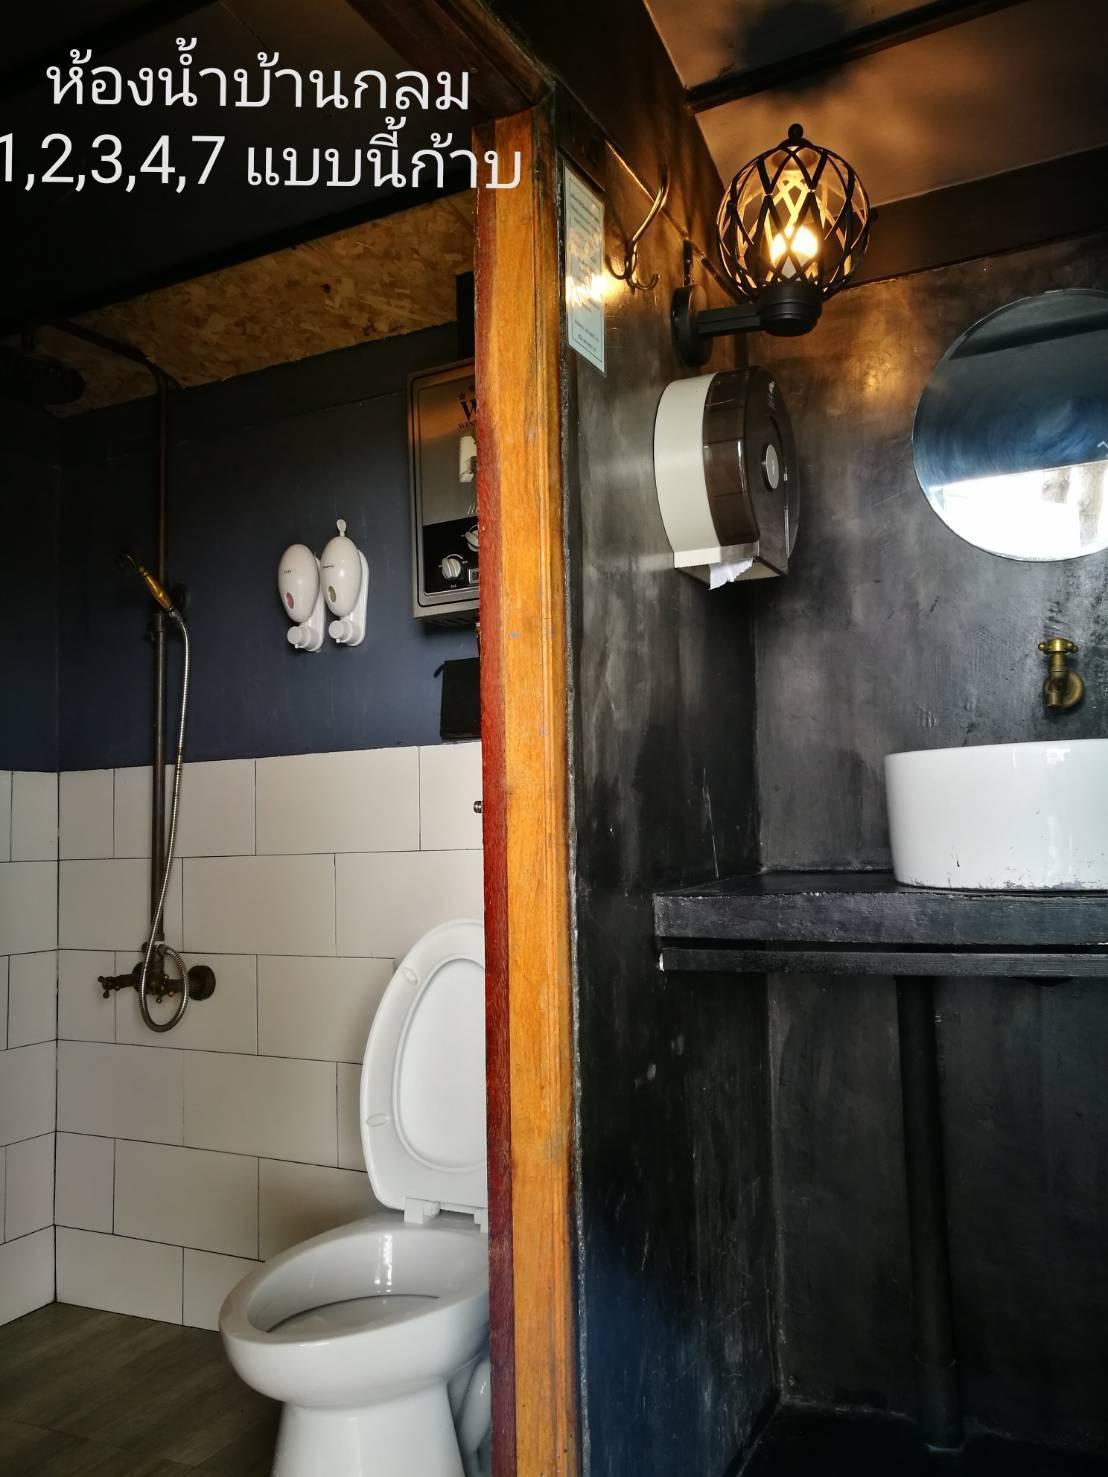 LAKE HILL สตูดิโอ บ้านเดี่ยว 1 ห้องน้ำส่วนตัว ขนาด 25 ตร.ม. – กลางเมือง